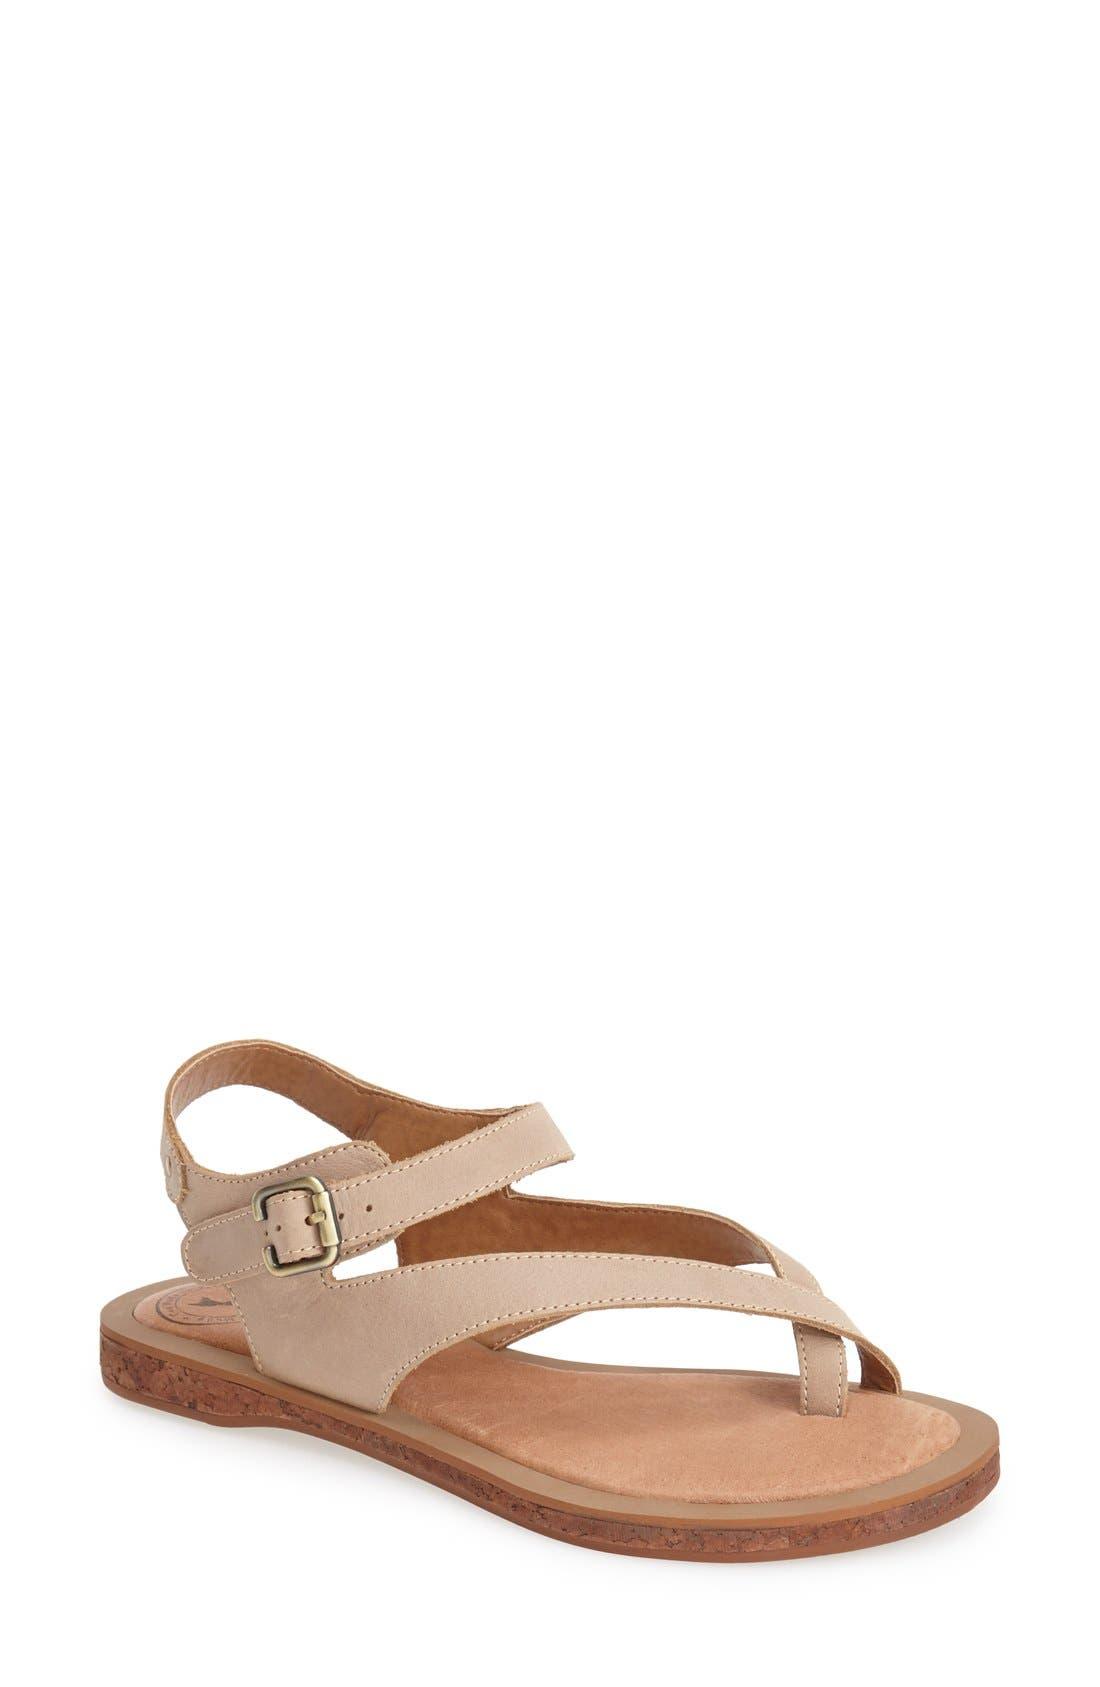 Main Image - Gee WaWa 'Montana' Leather Sandal (Women)